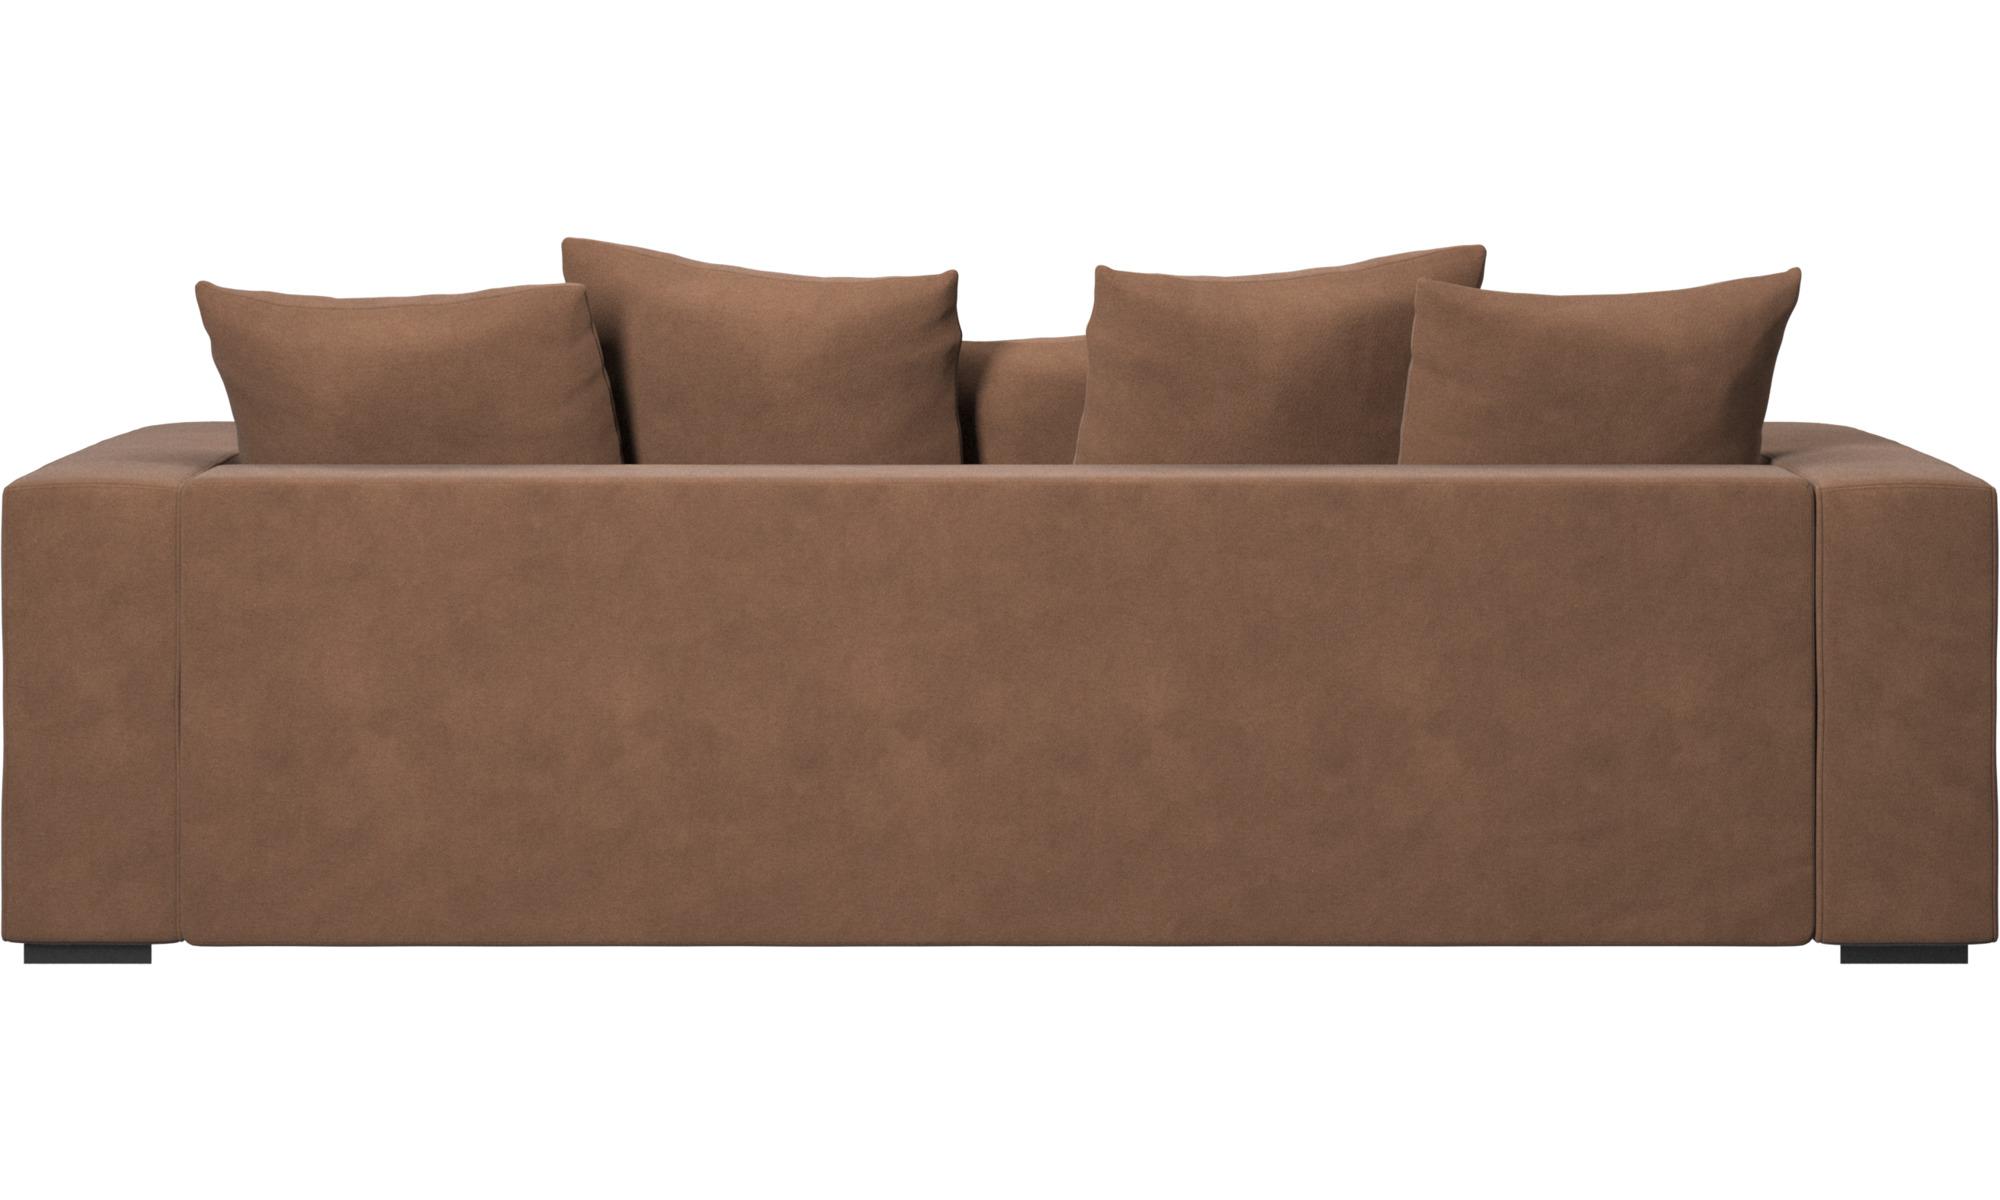 3 seater sofas cenova sofa boconcept. Black Bedroom Furniture Sets. Home Design Ideas